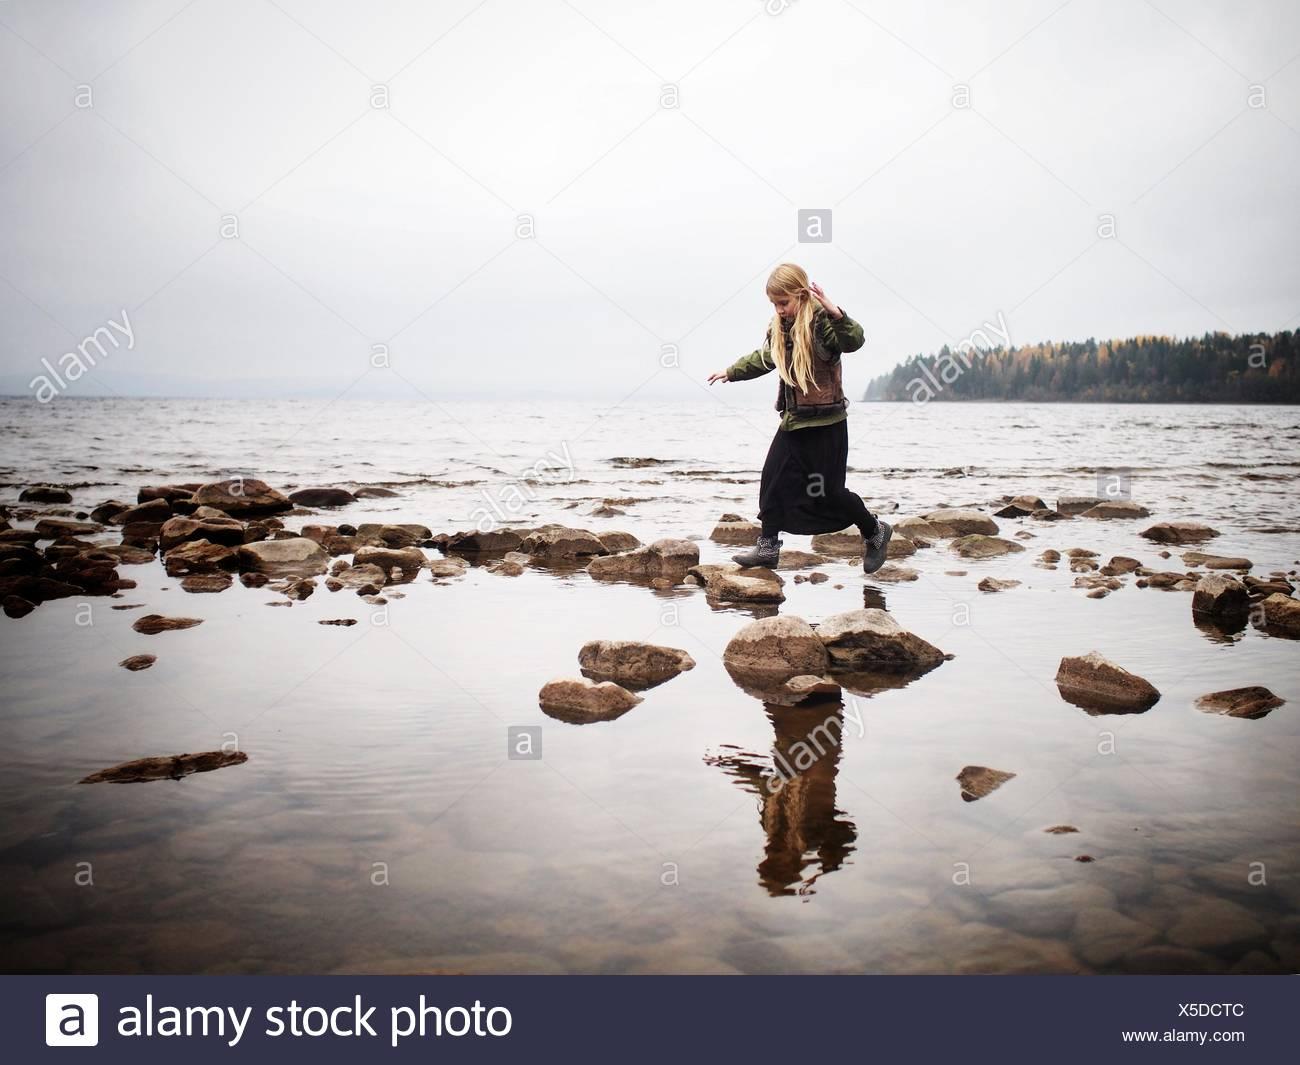 Sweden, Dalarna, Young girl (8-9) walking on stones at lake Siljan - Stock Image